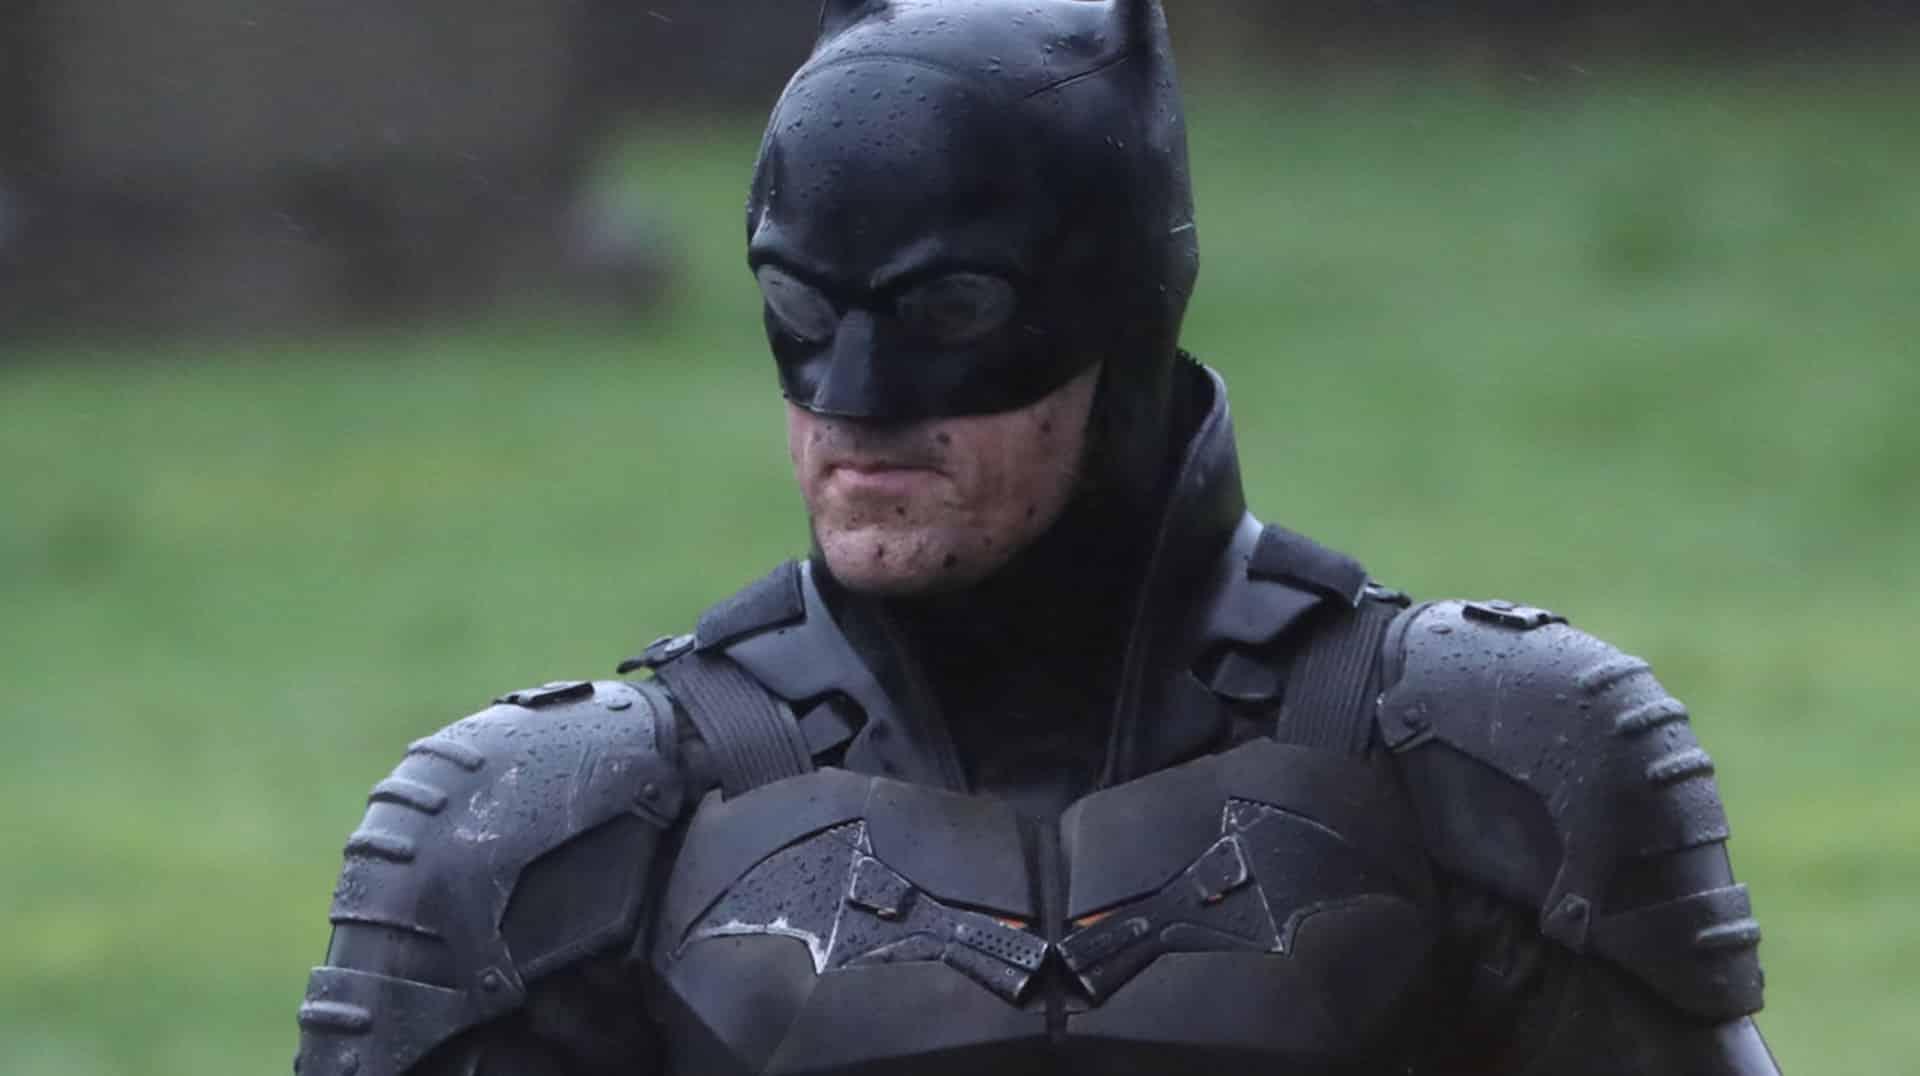 The Batman, Robert Pattinson, Batsuit, Batcycle